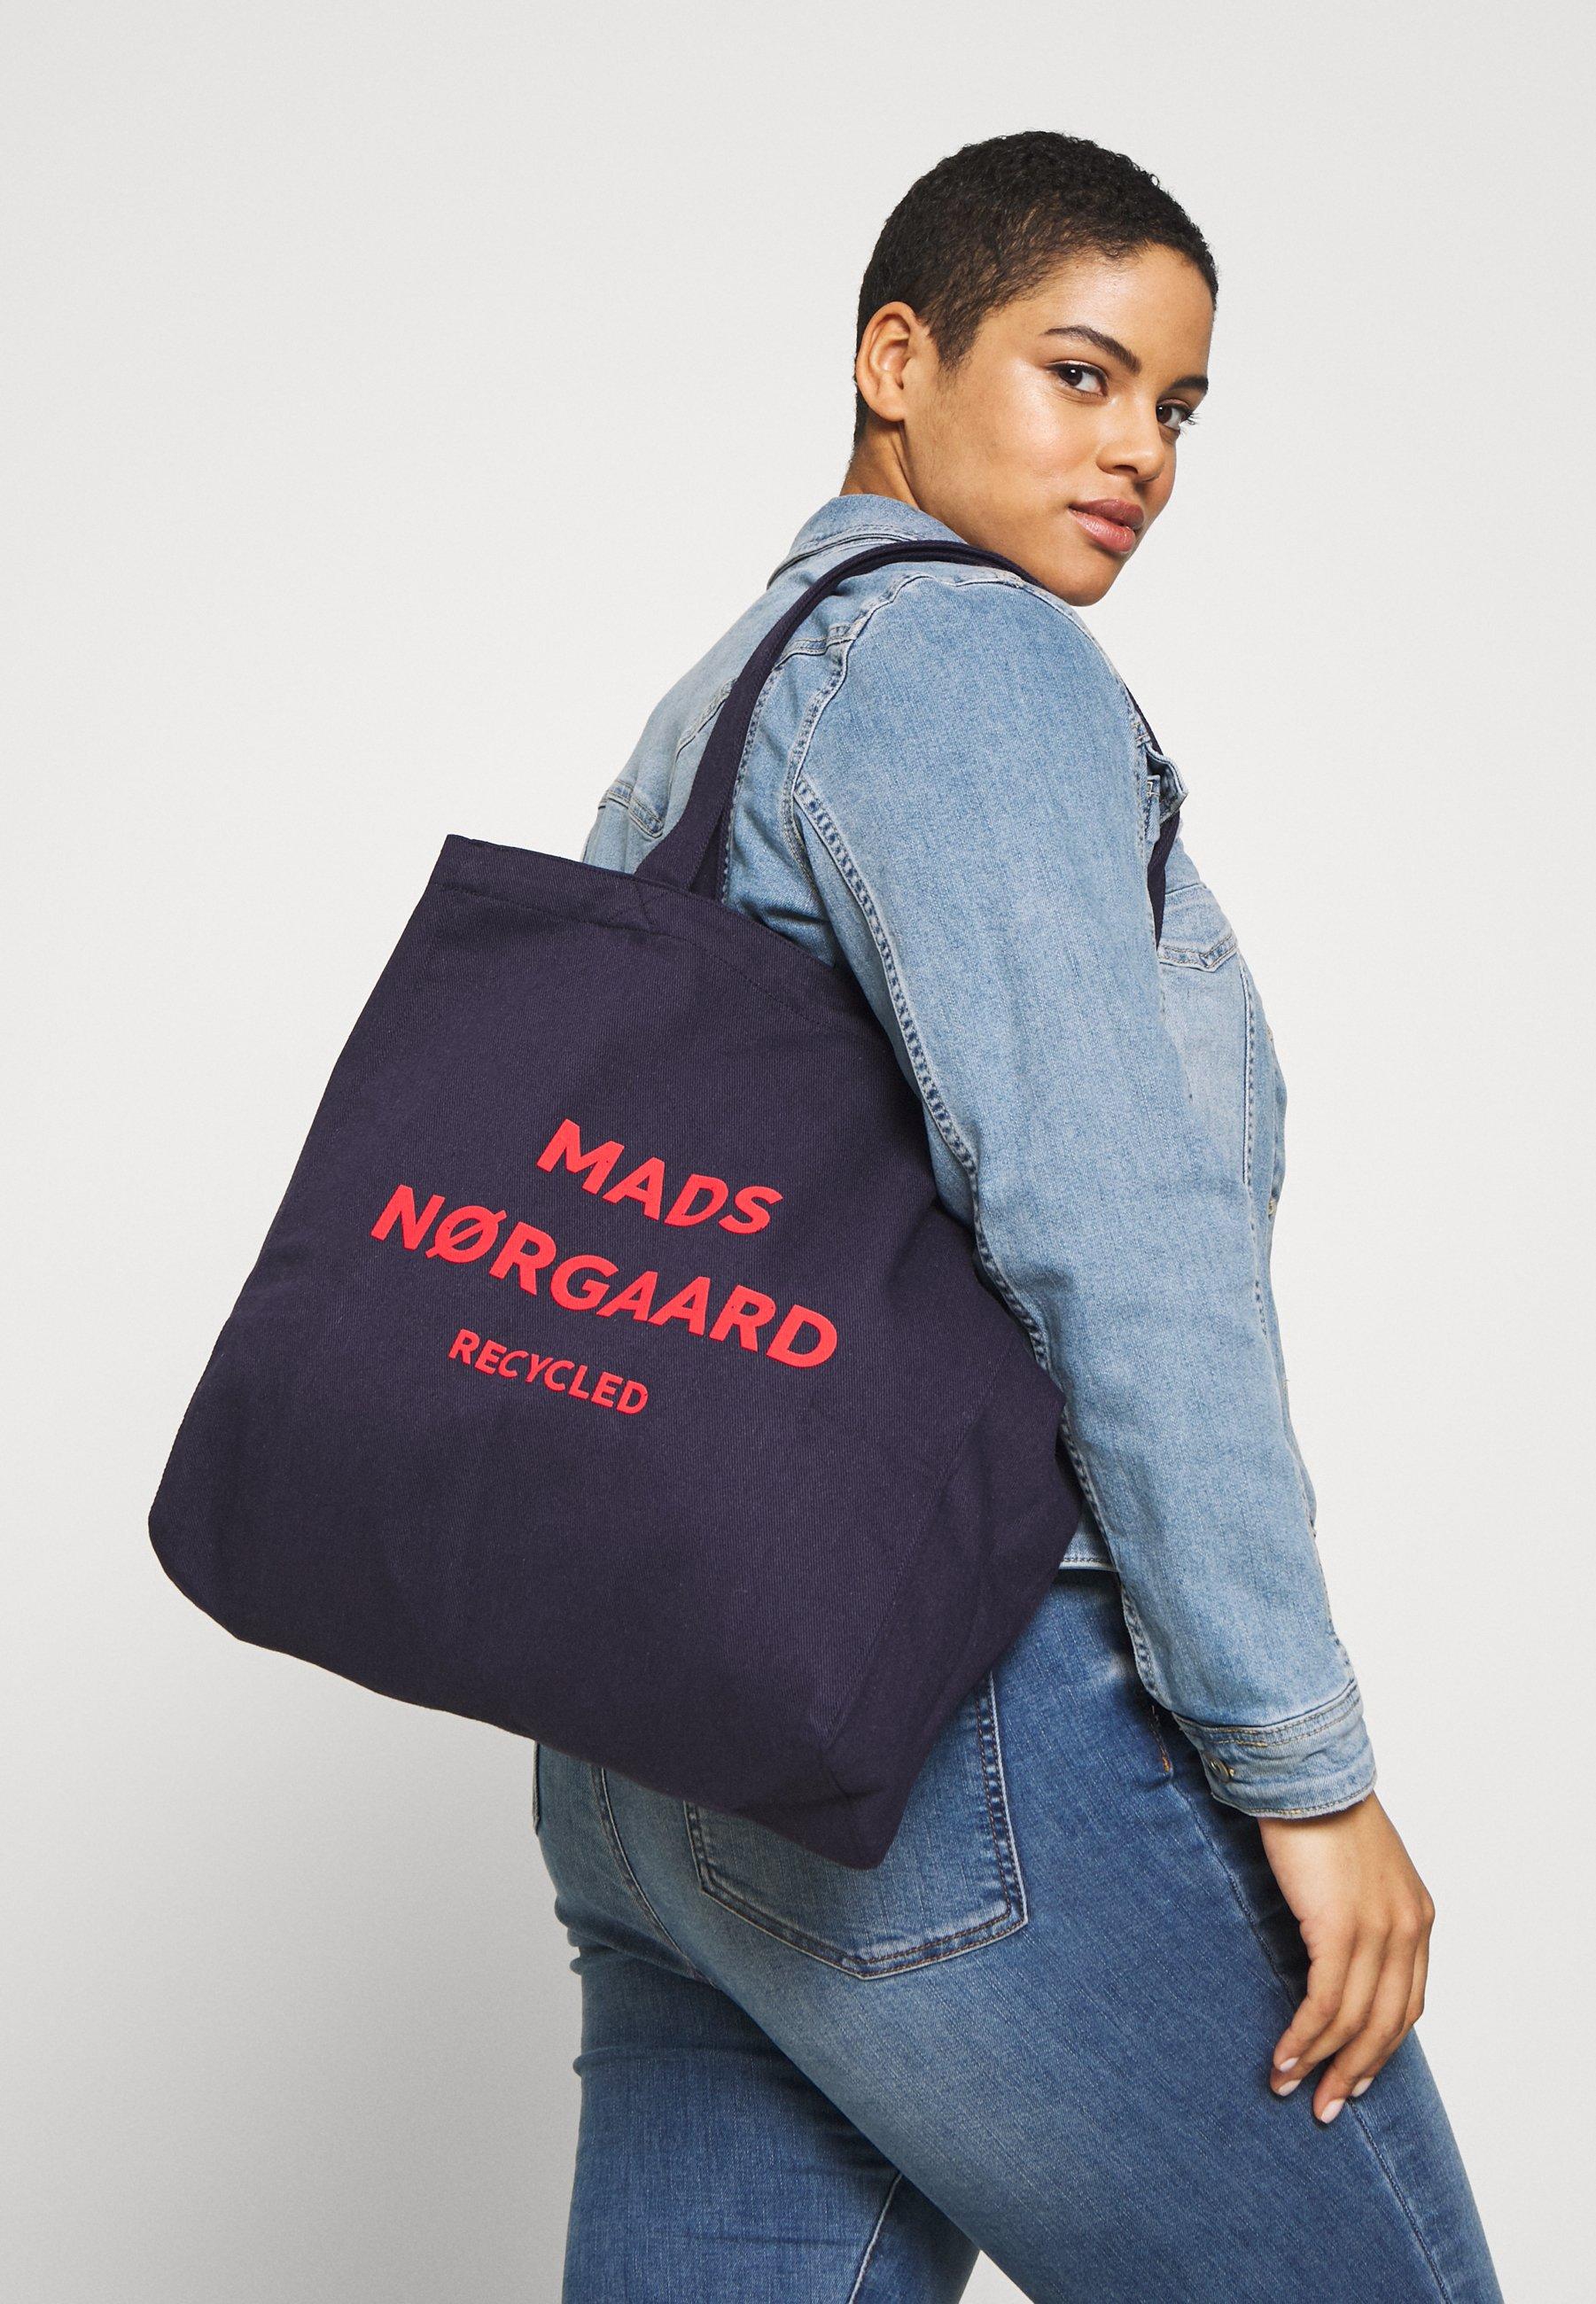 Mads N?rgaard BOUTIQUE ATHENE - Shopping bag - navy/red